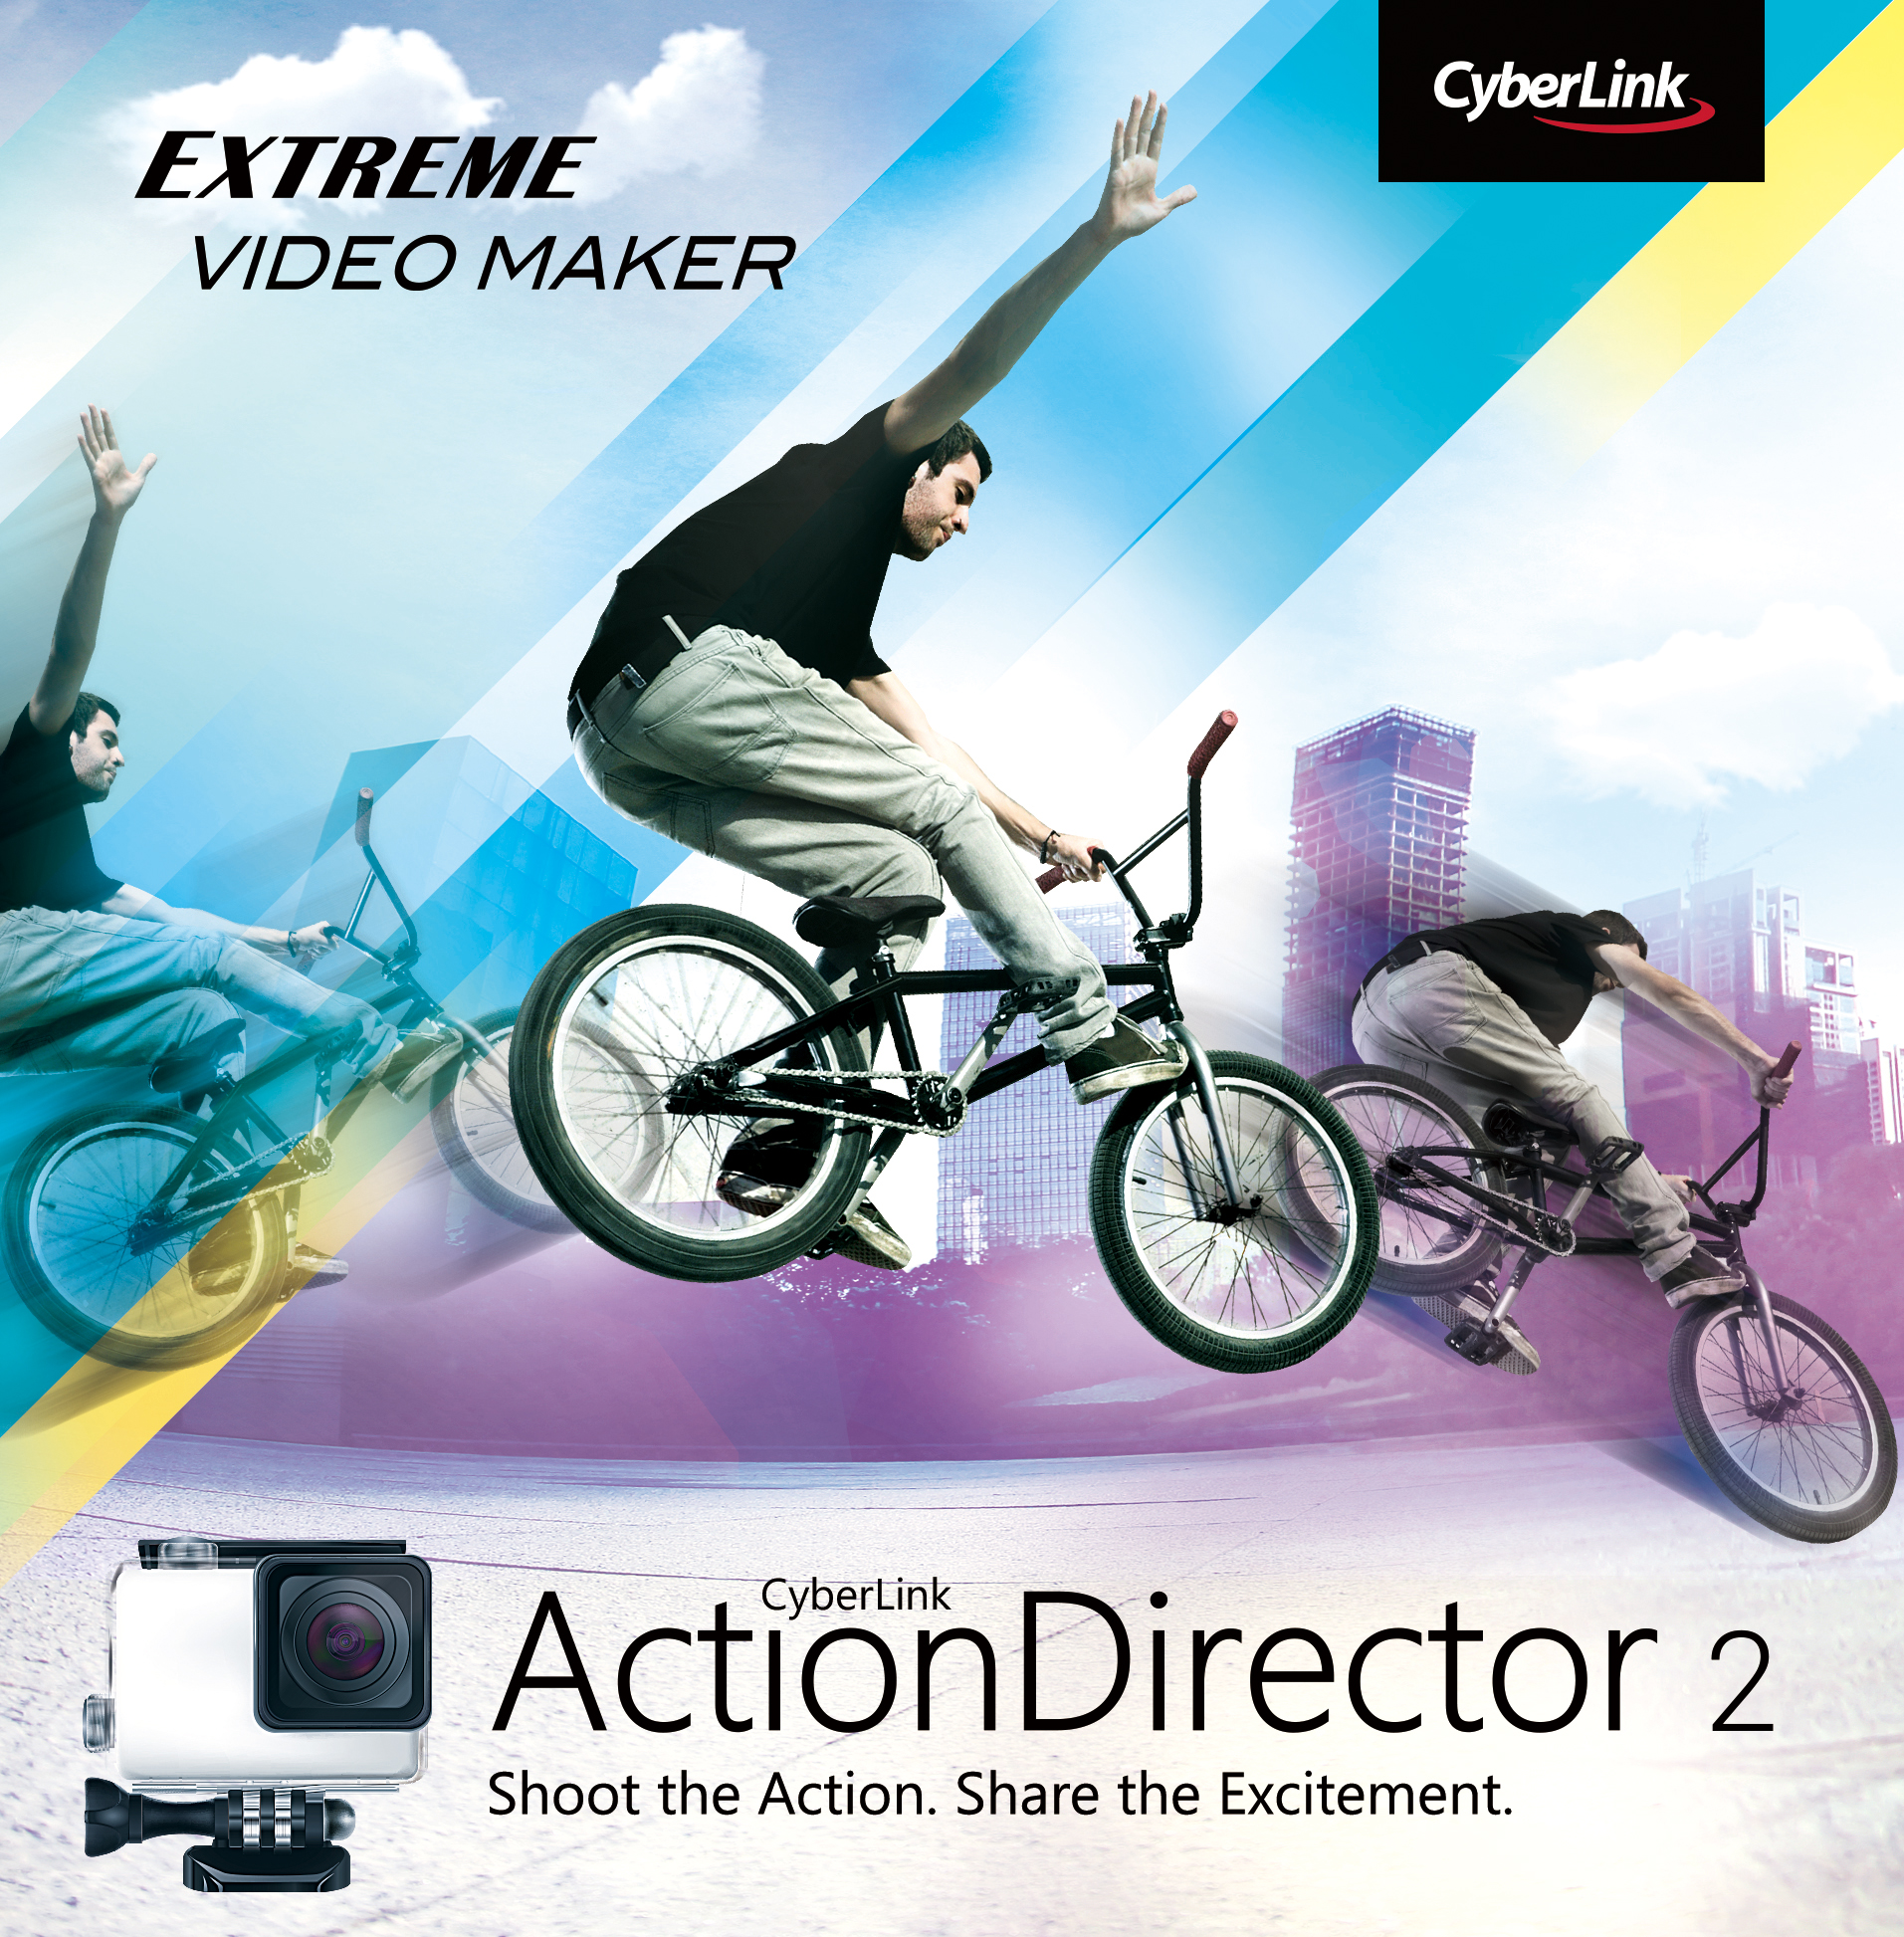 ActionDirector 2